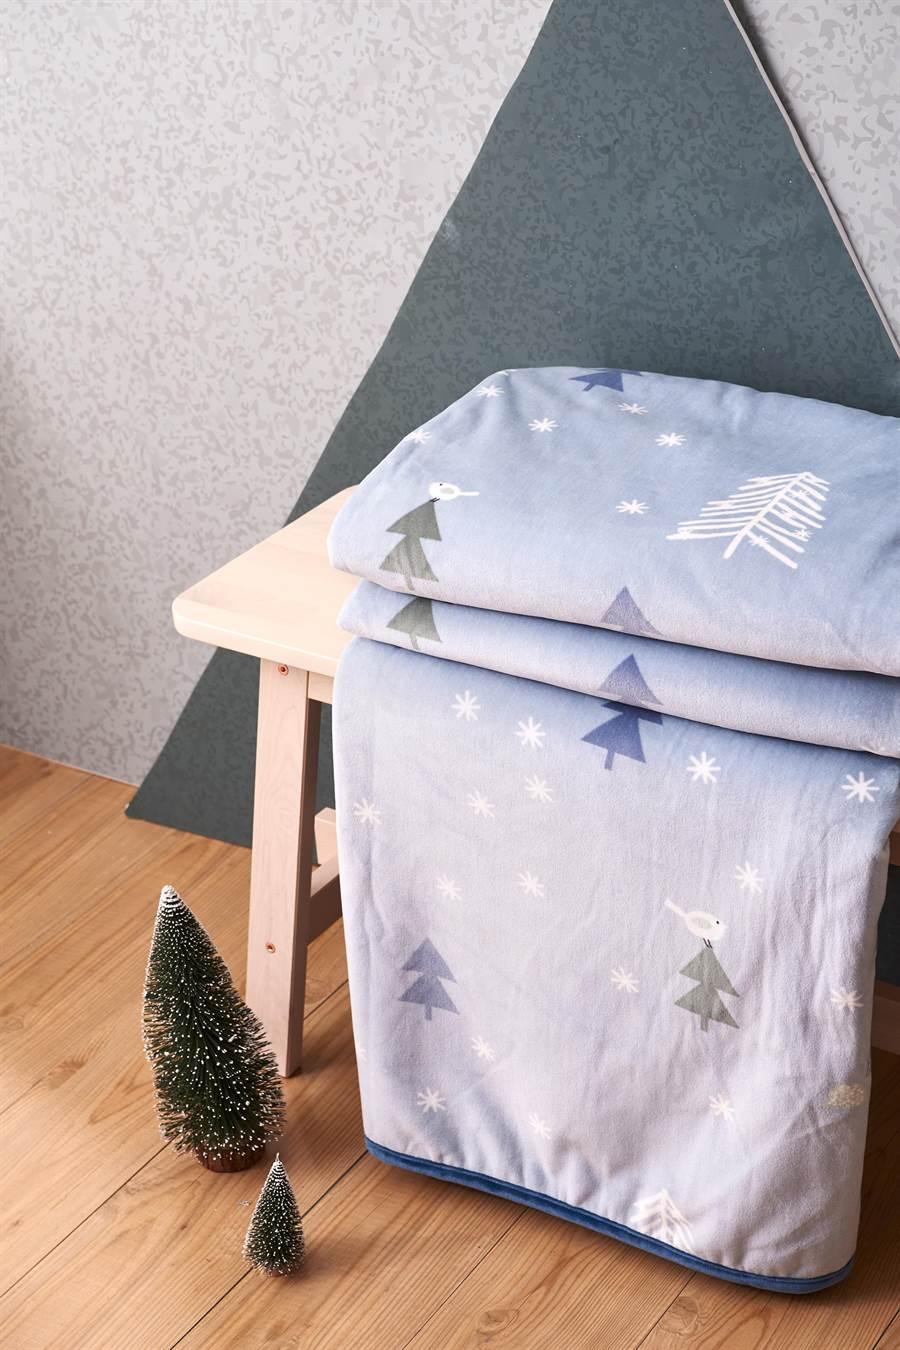 Lamode小森林親柔毯原價4560元,特價2280元。(東妮寢飾提供)